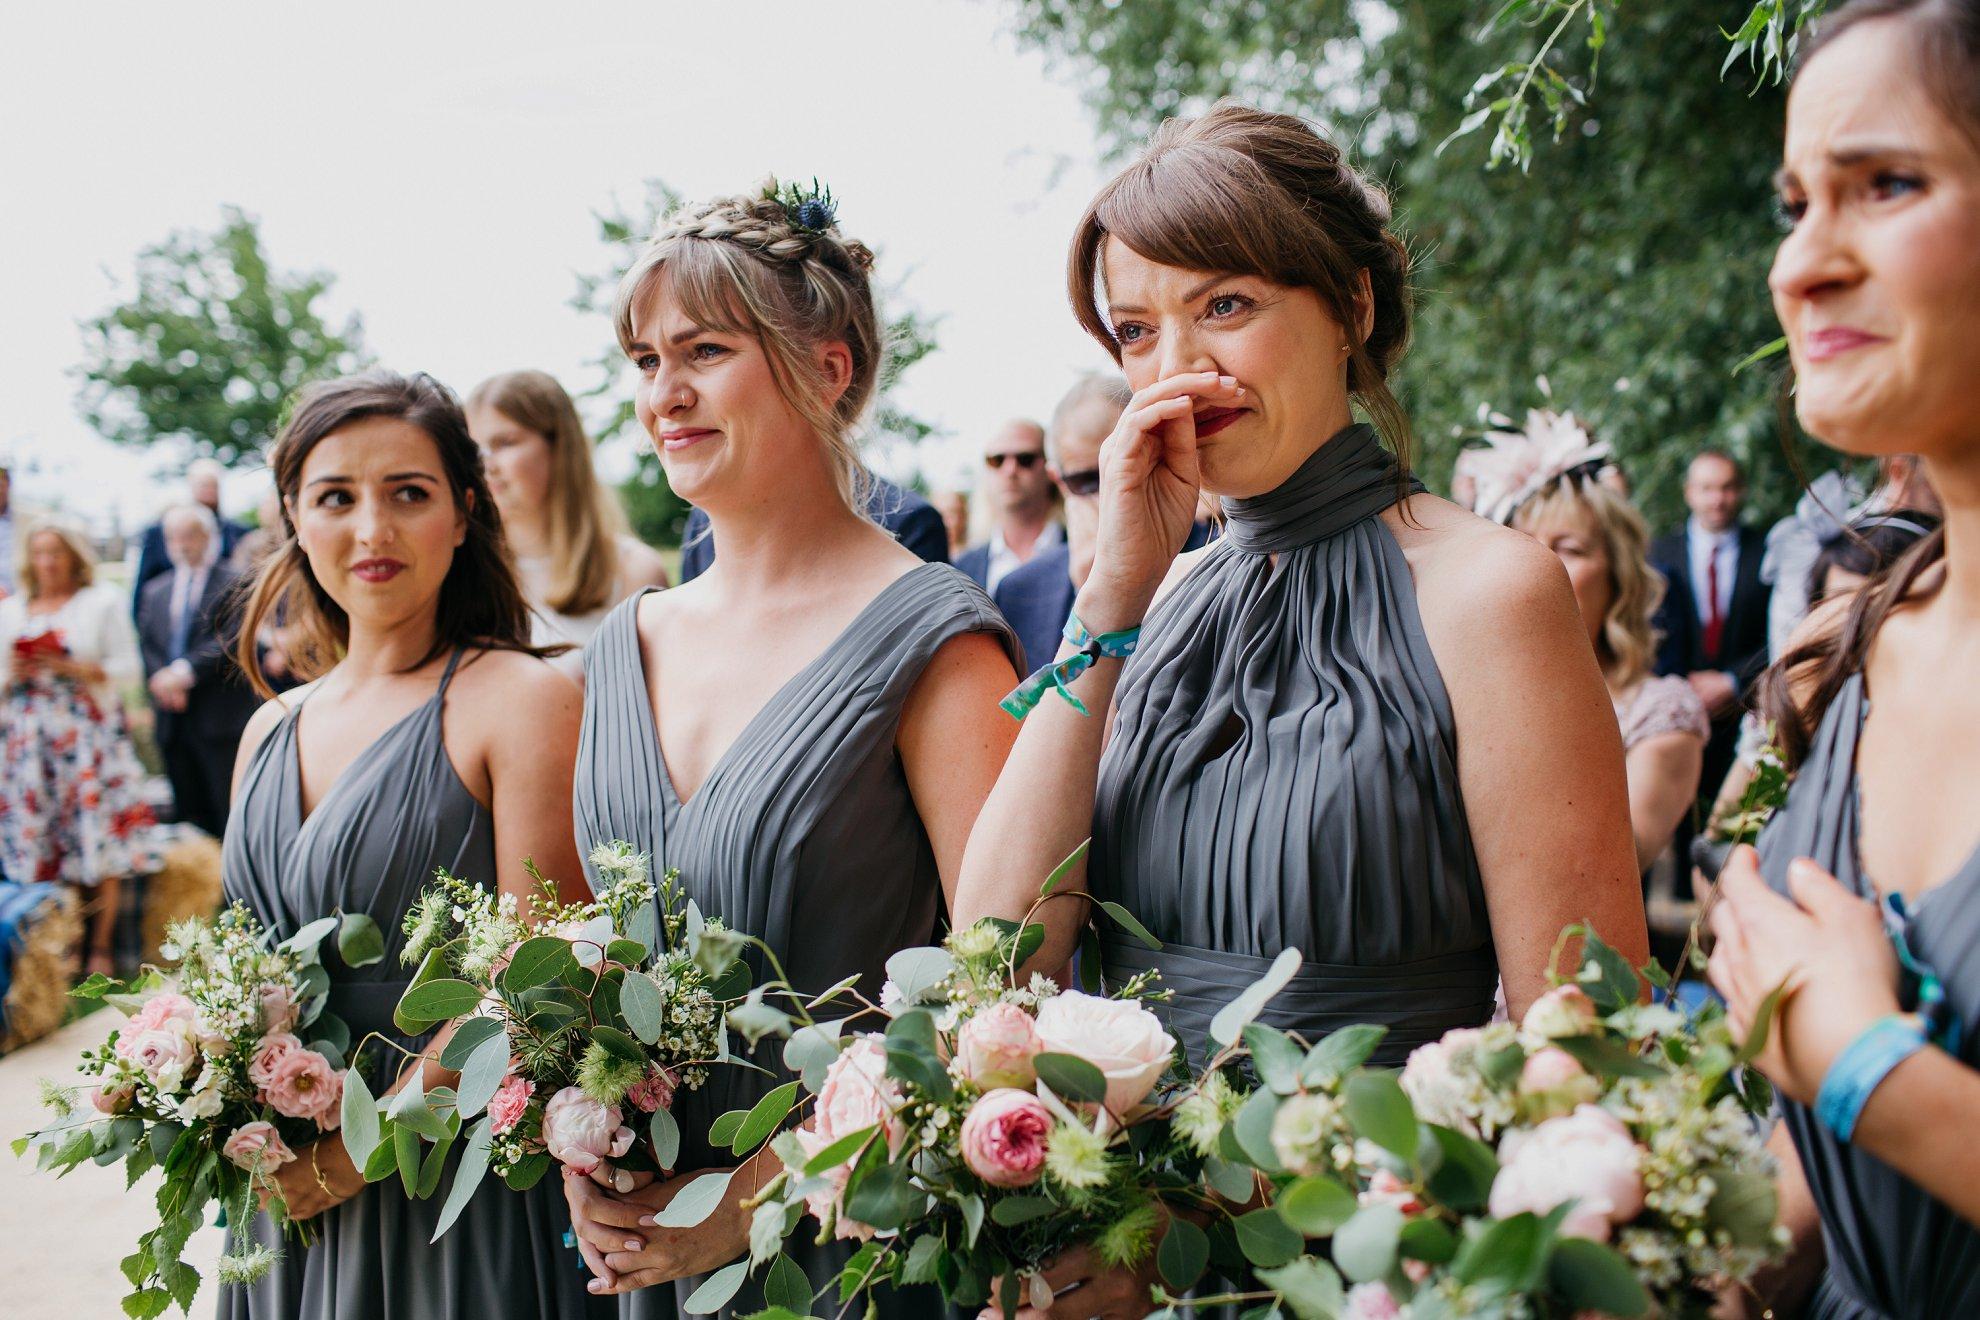 skipbridge country weddings photos